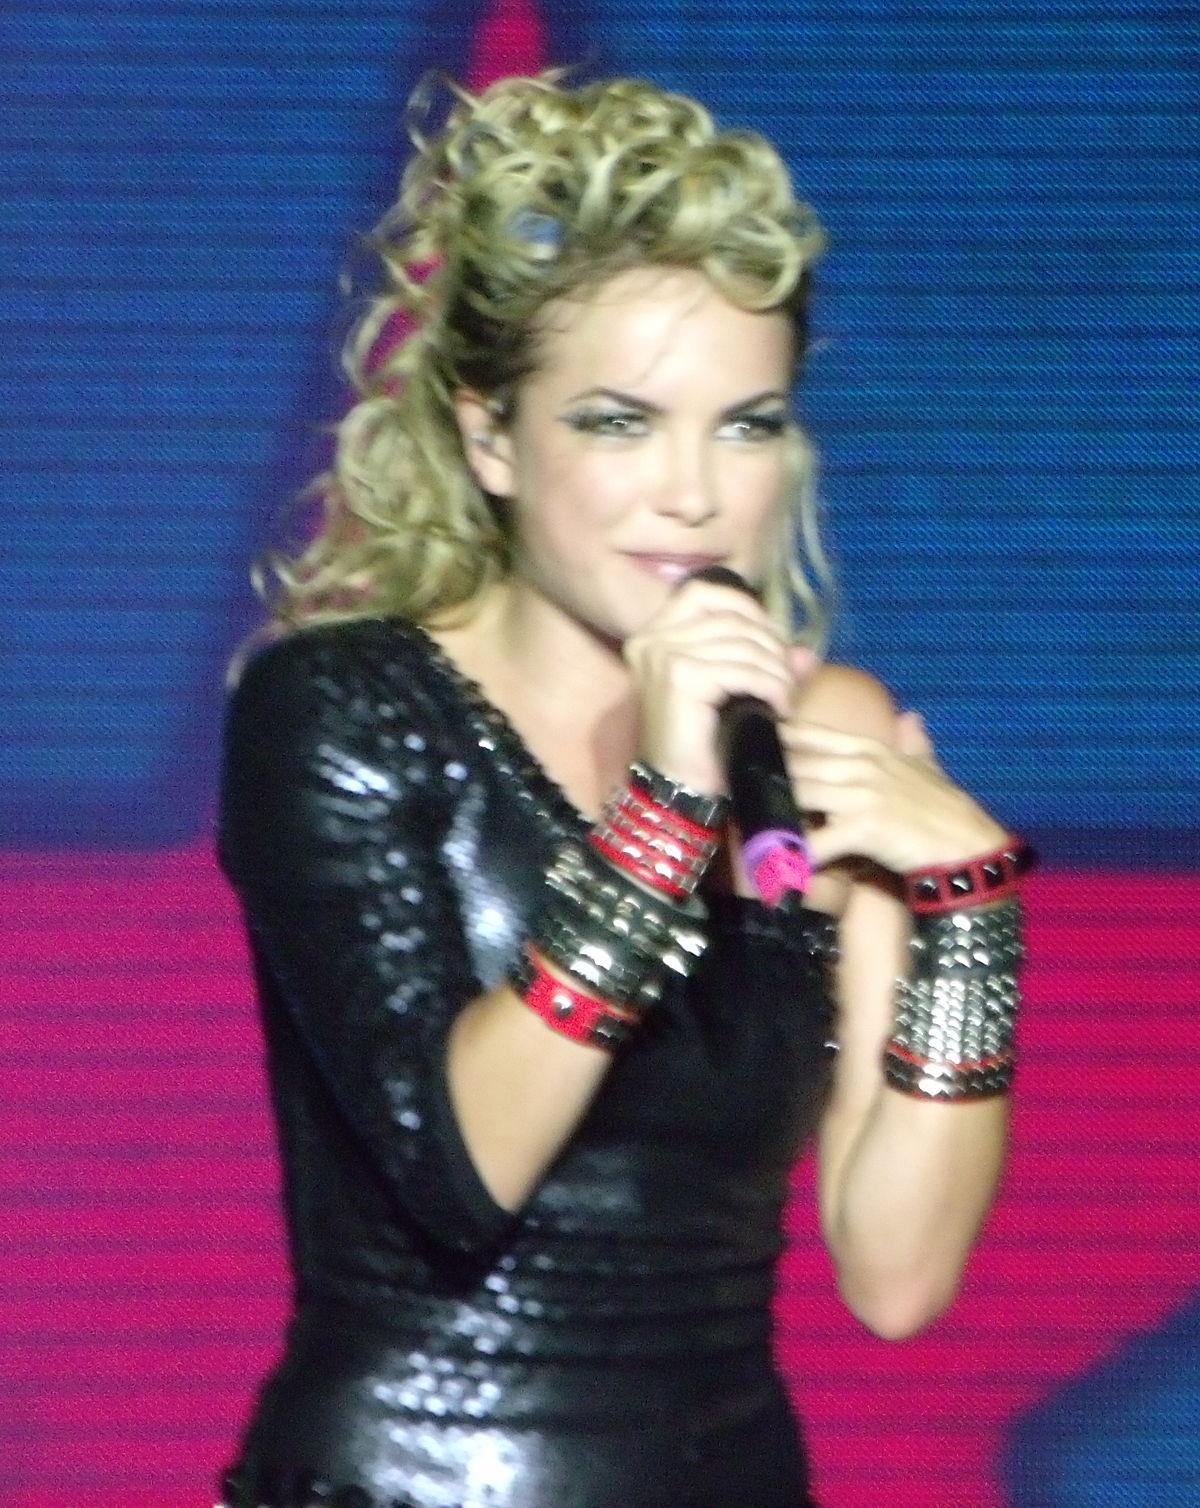 Brazil sao paulo sao caetano do sul girl webcam brazilian - 1 part 4